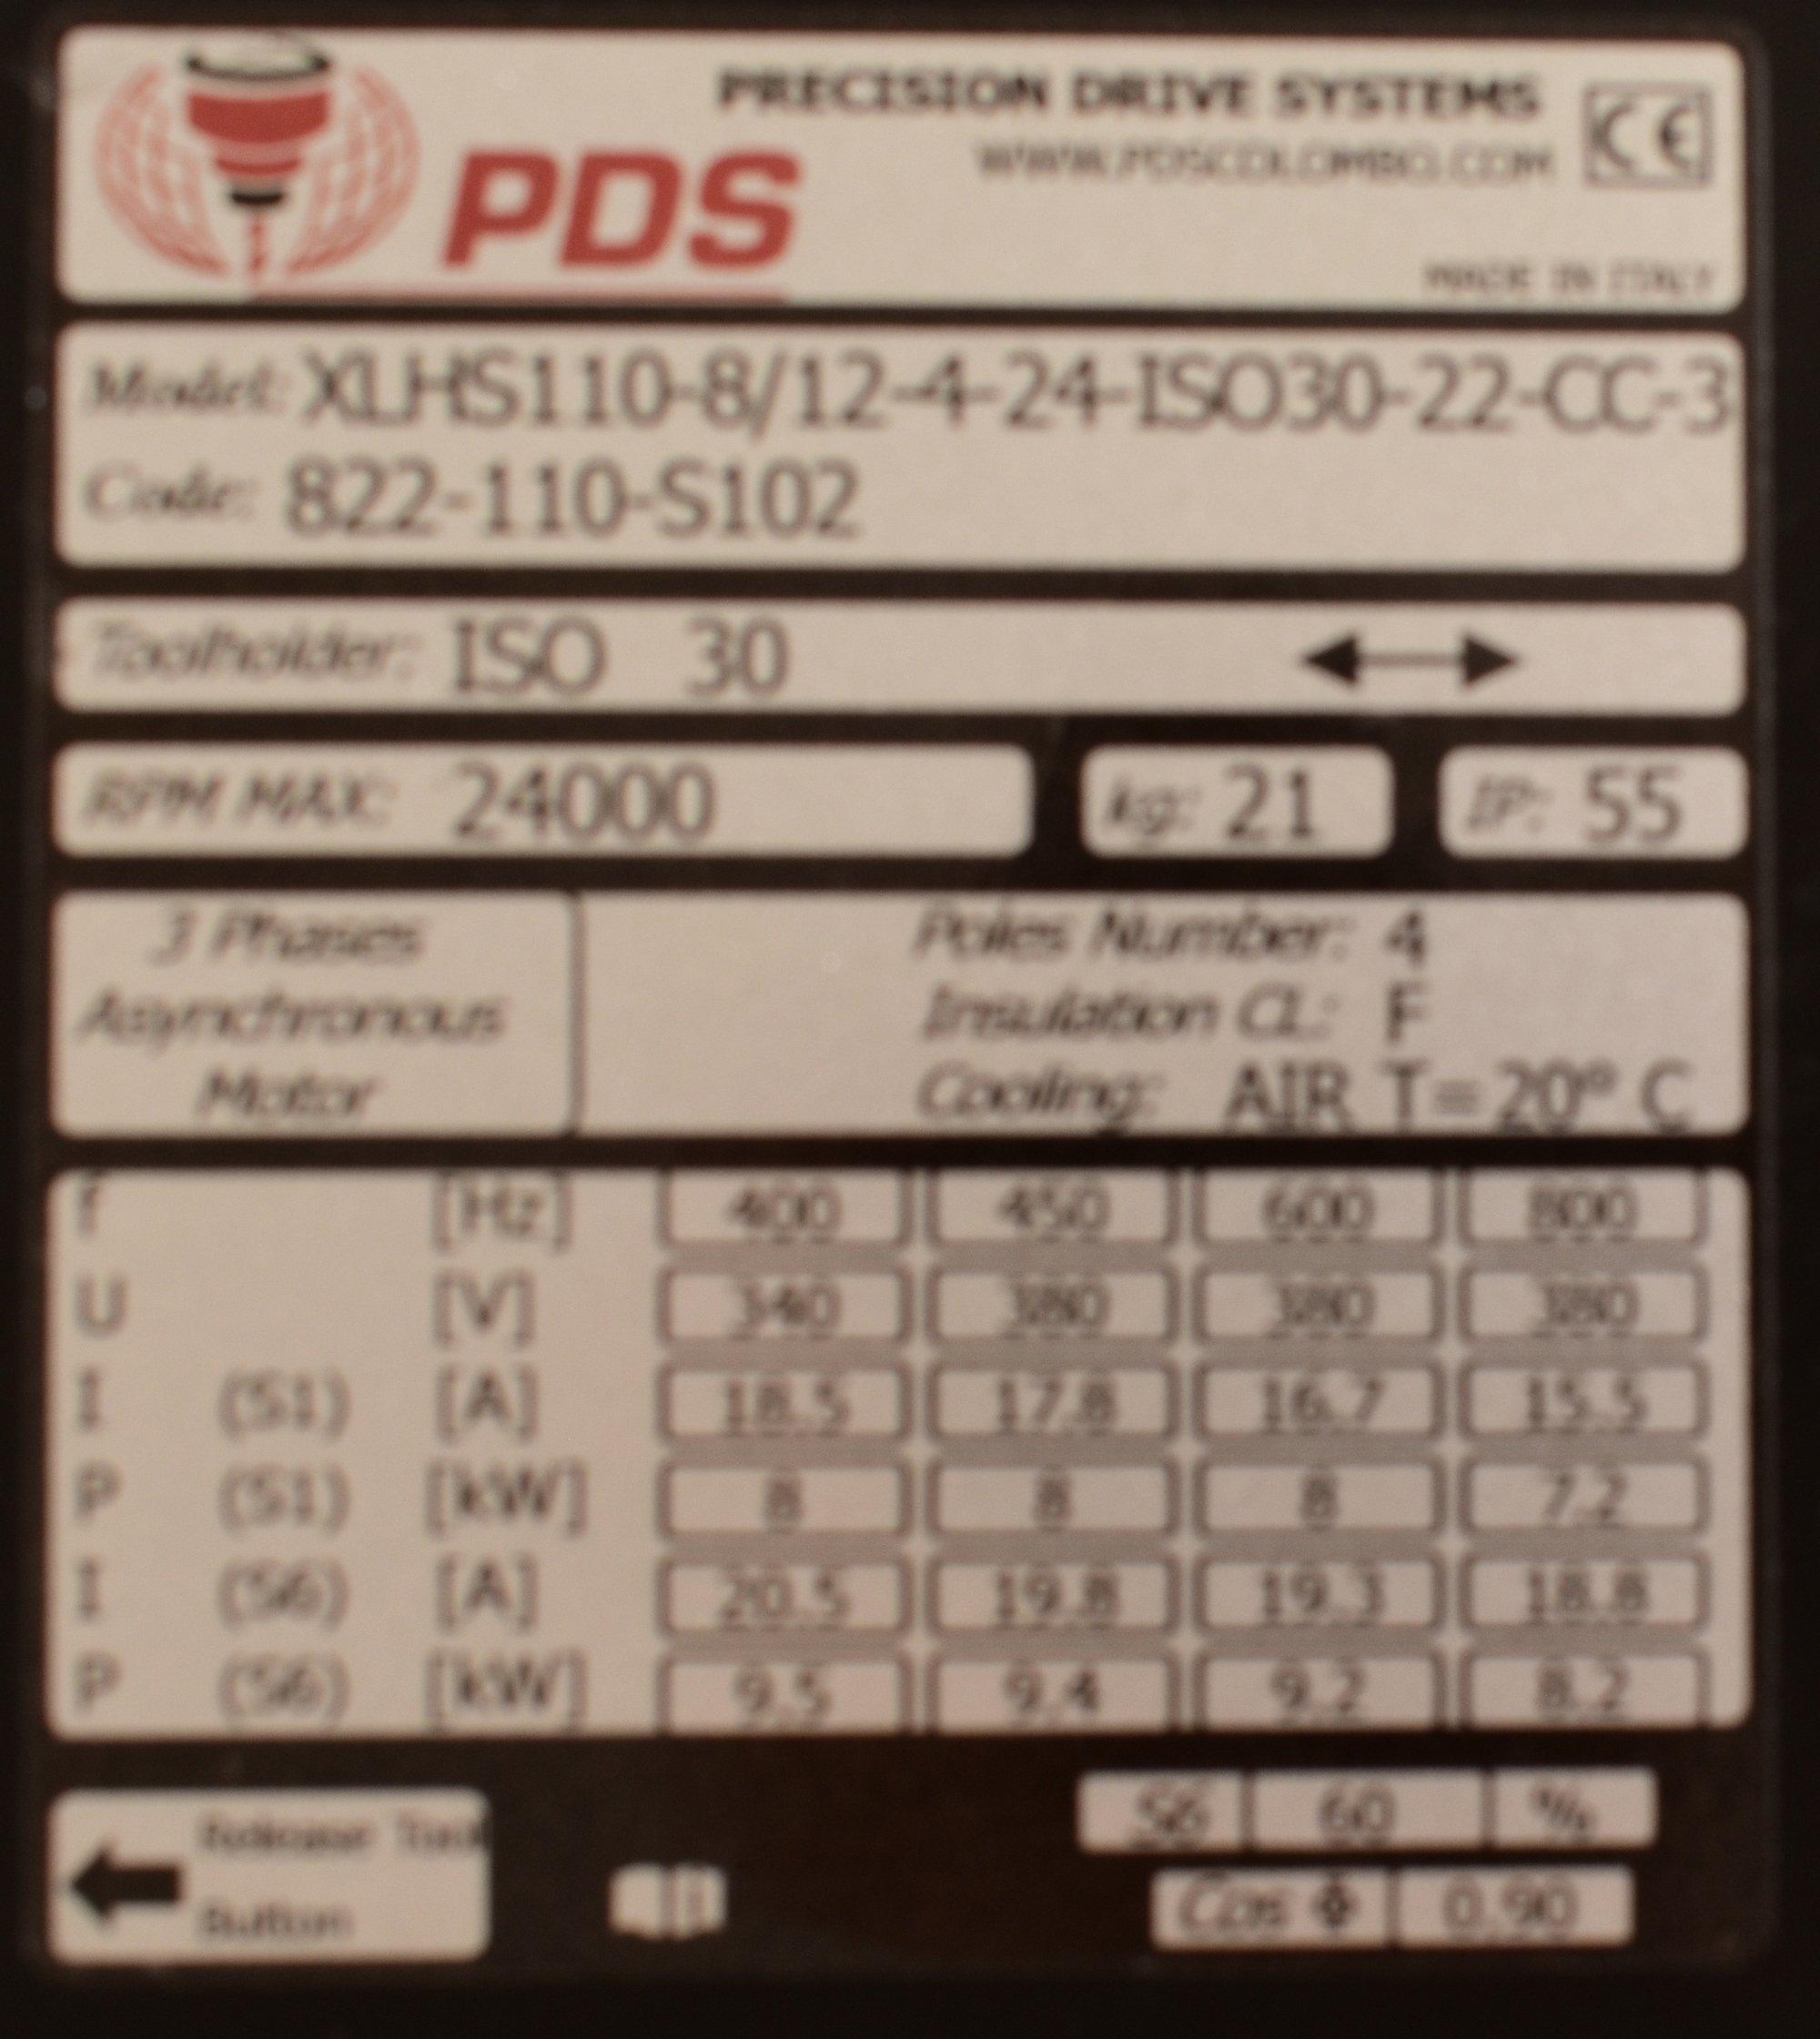 QE-1F 8_12 24 I30 NC CB - Name Plate Sn IP0005 - PDS